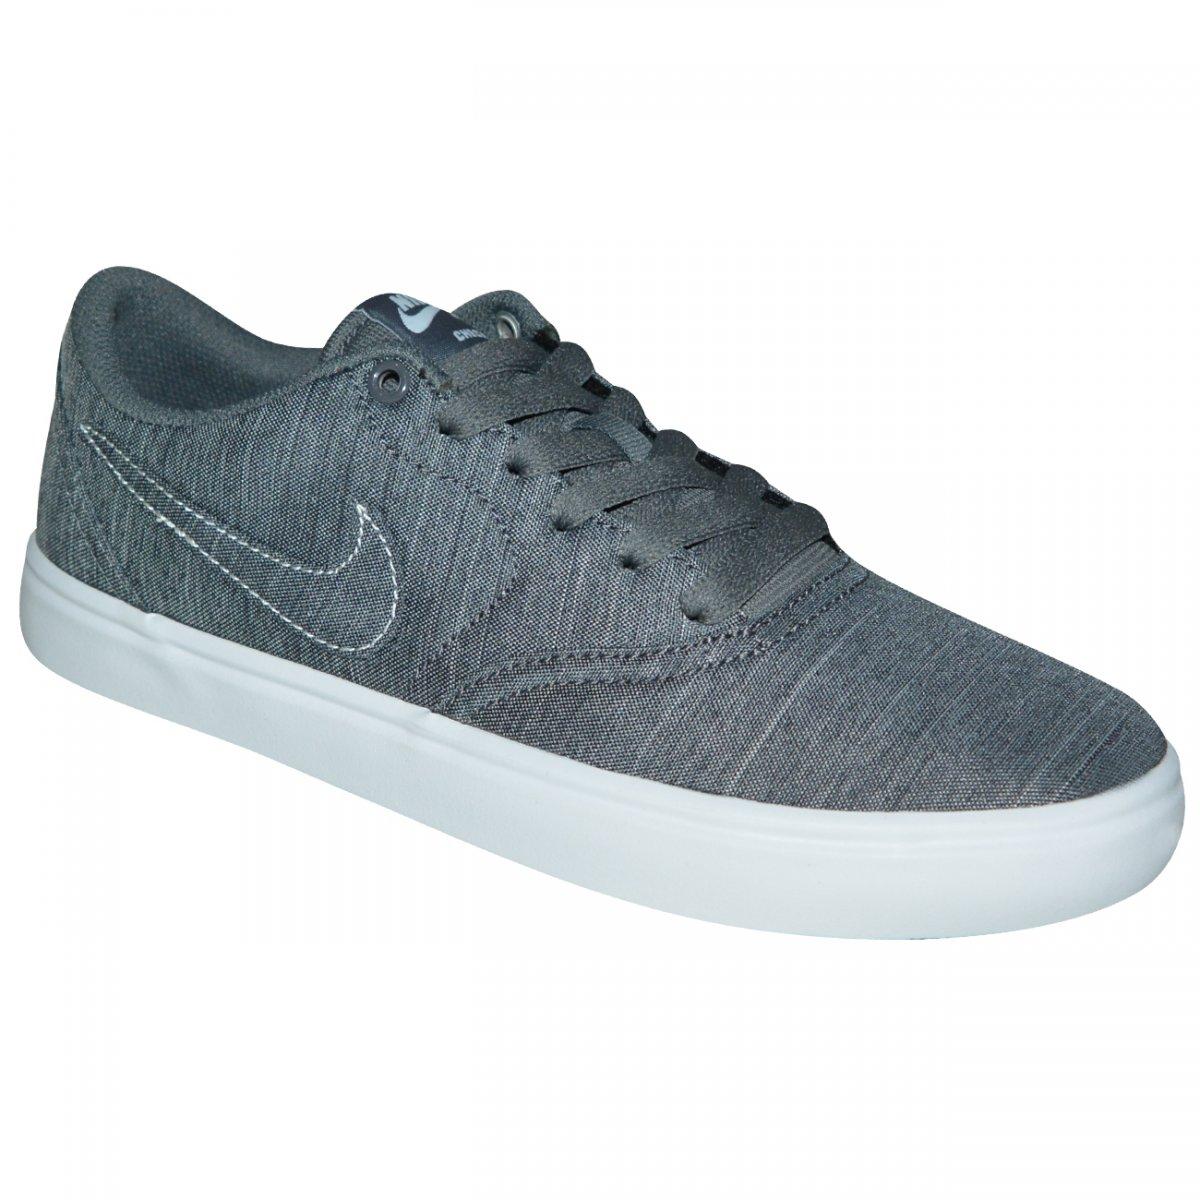 Tenis Nike SB Check Solar Cvs P 921464 004 - Mescla branco - Chuteira Nike a4c9a282a9ae2